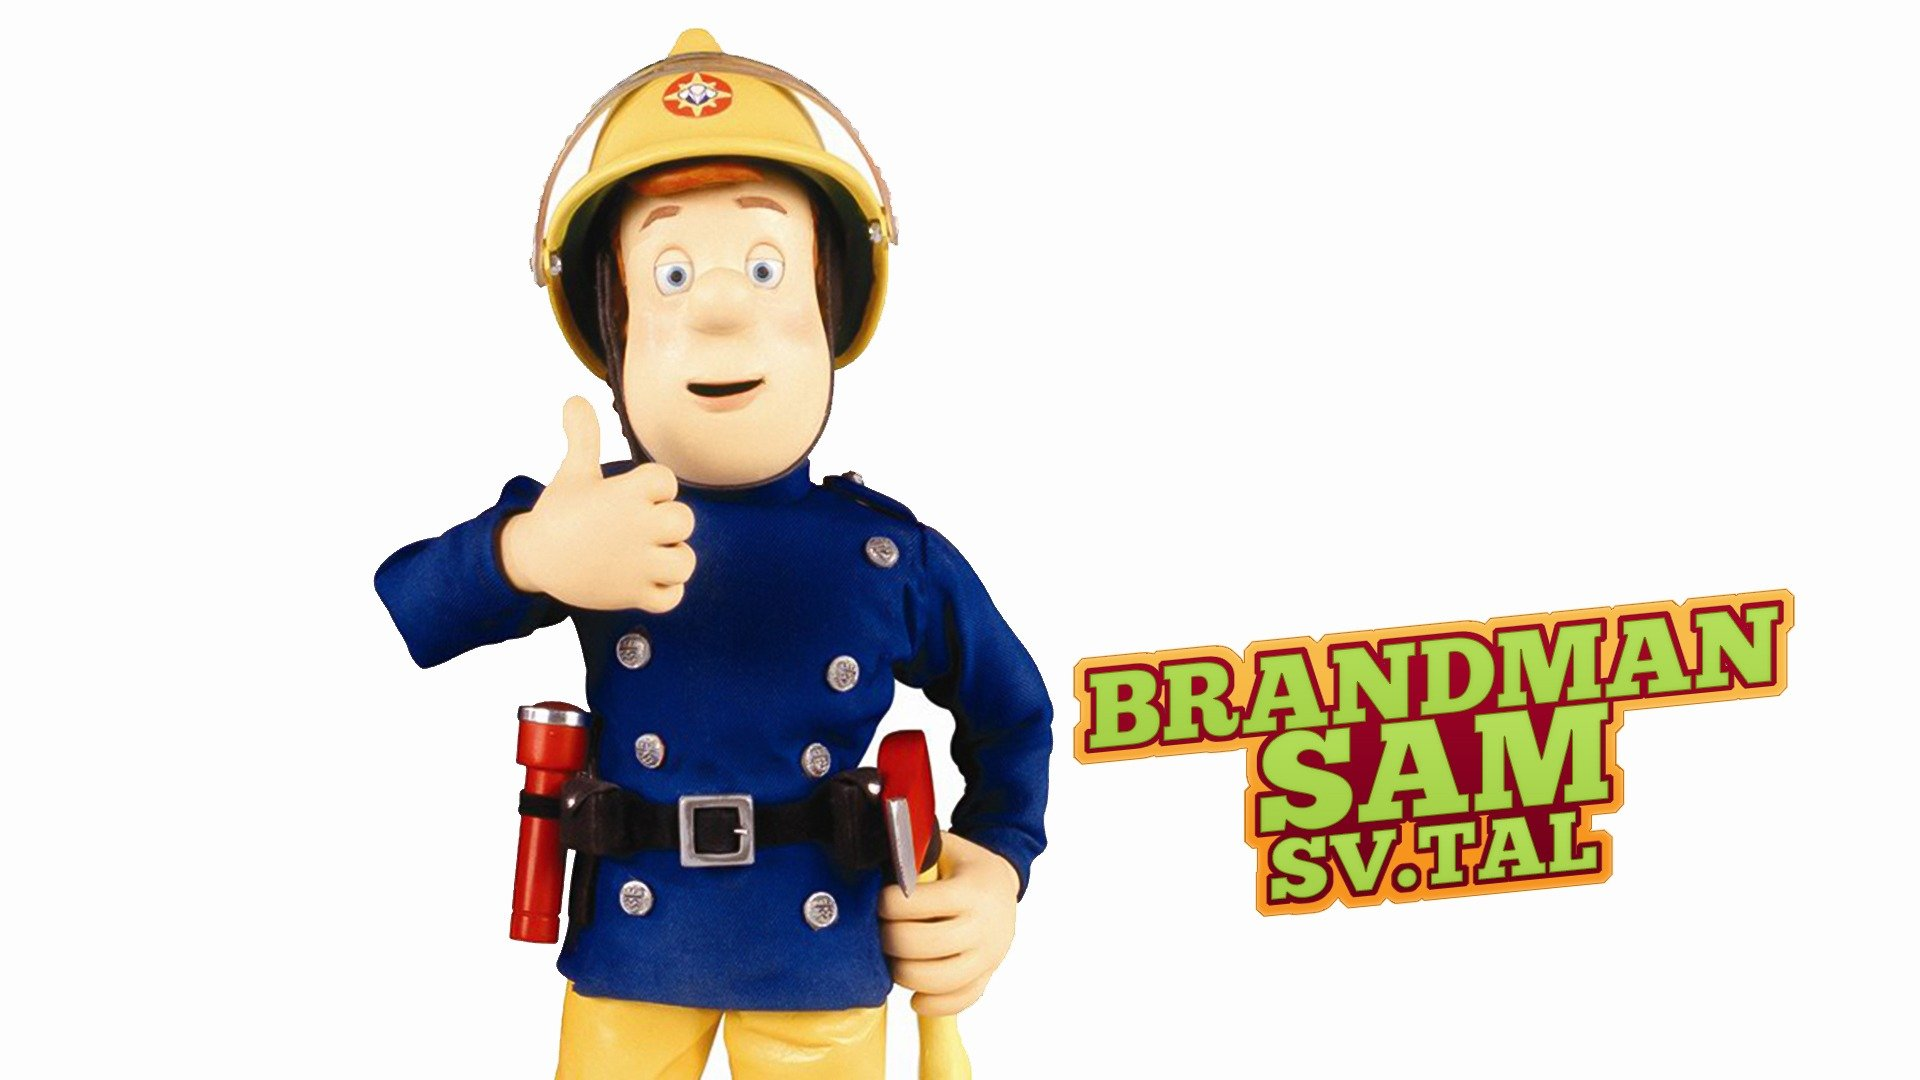 Brandman Sam - sv.tal